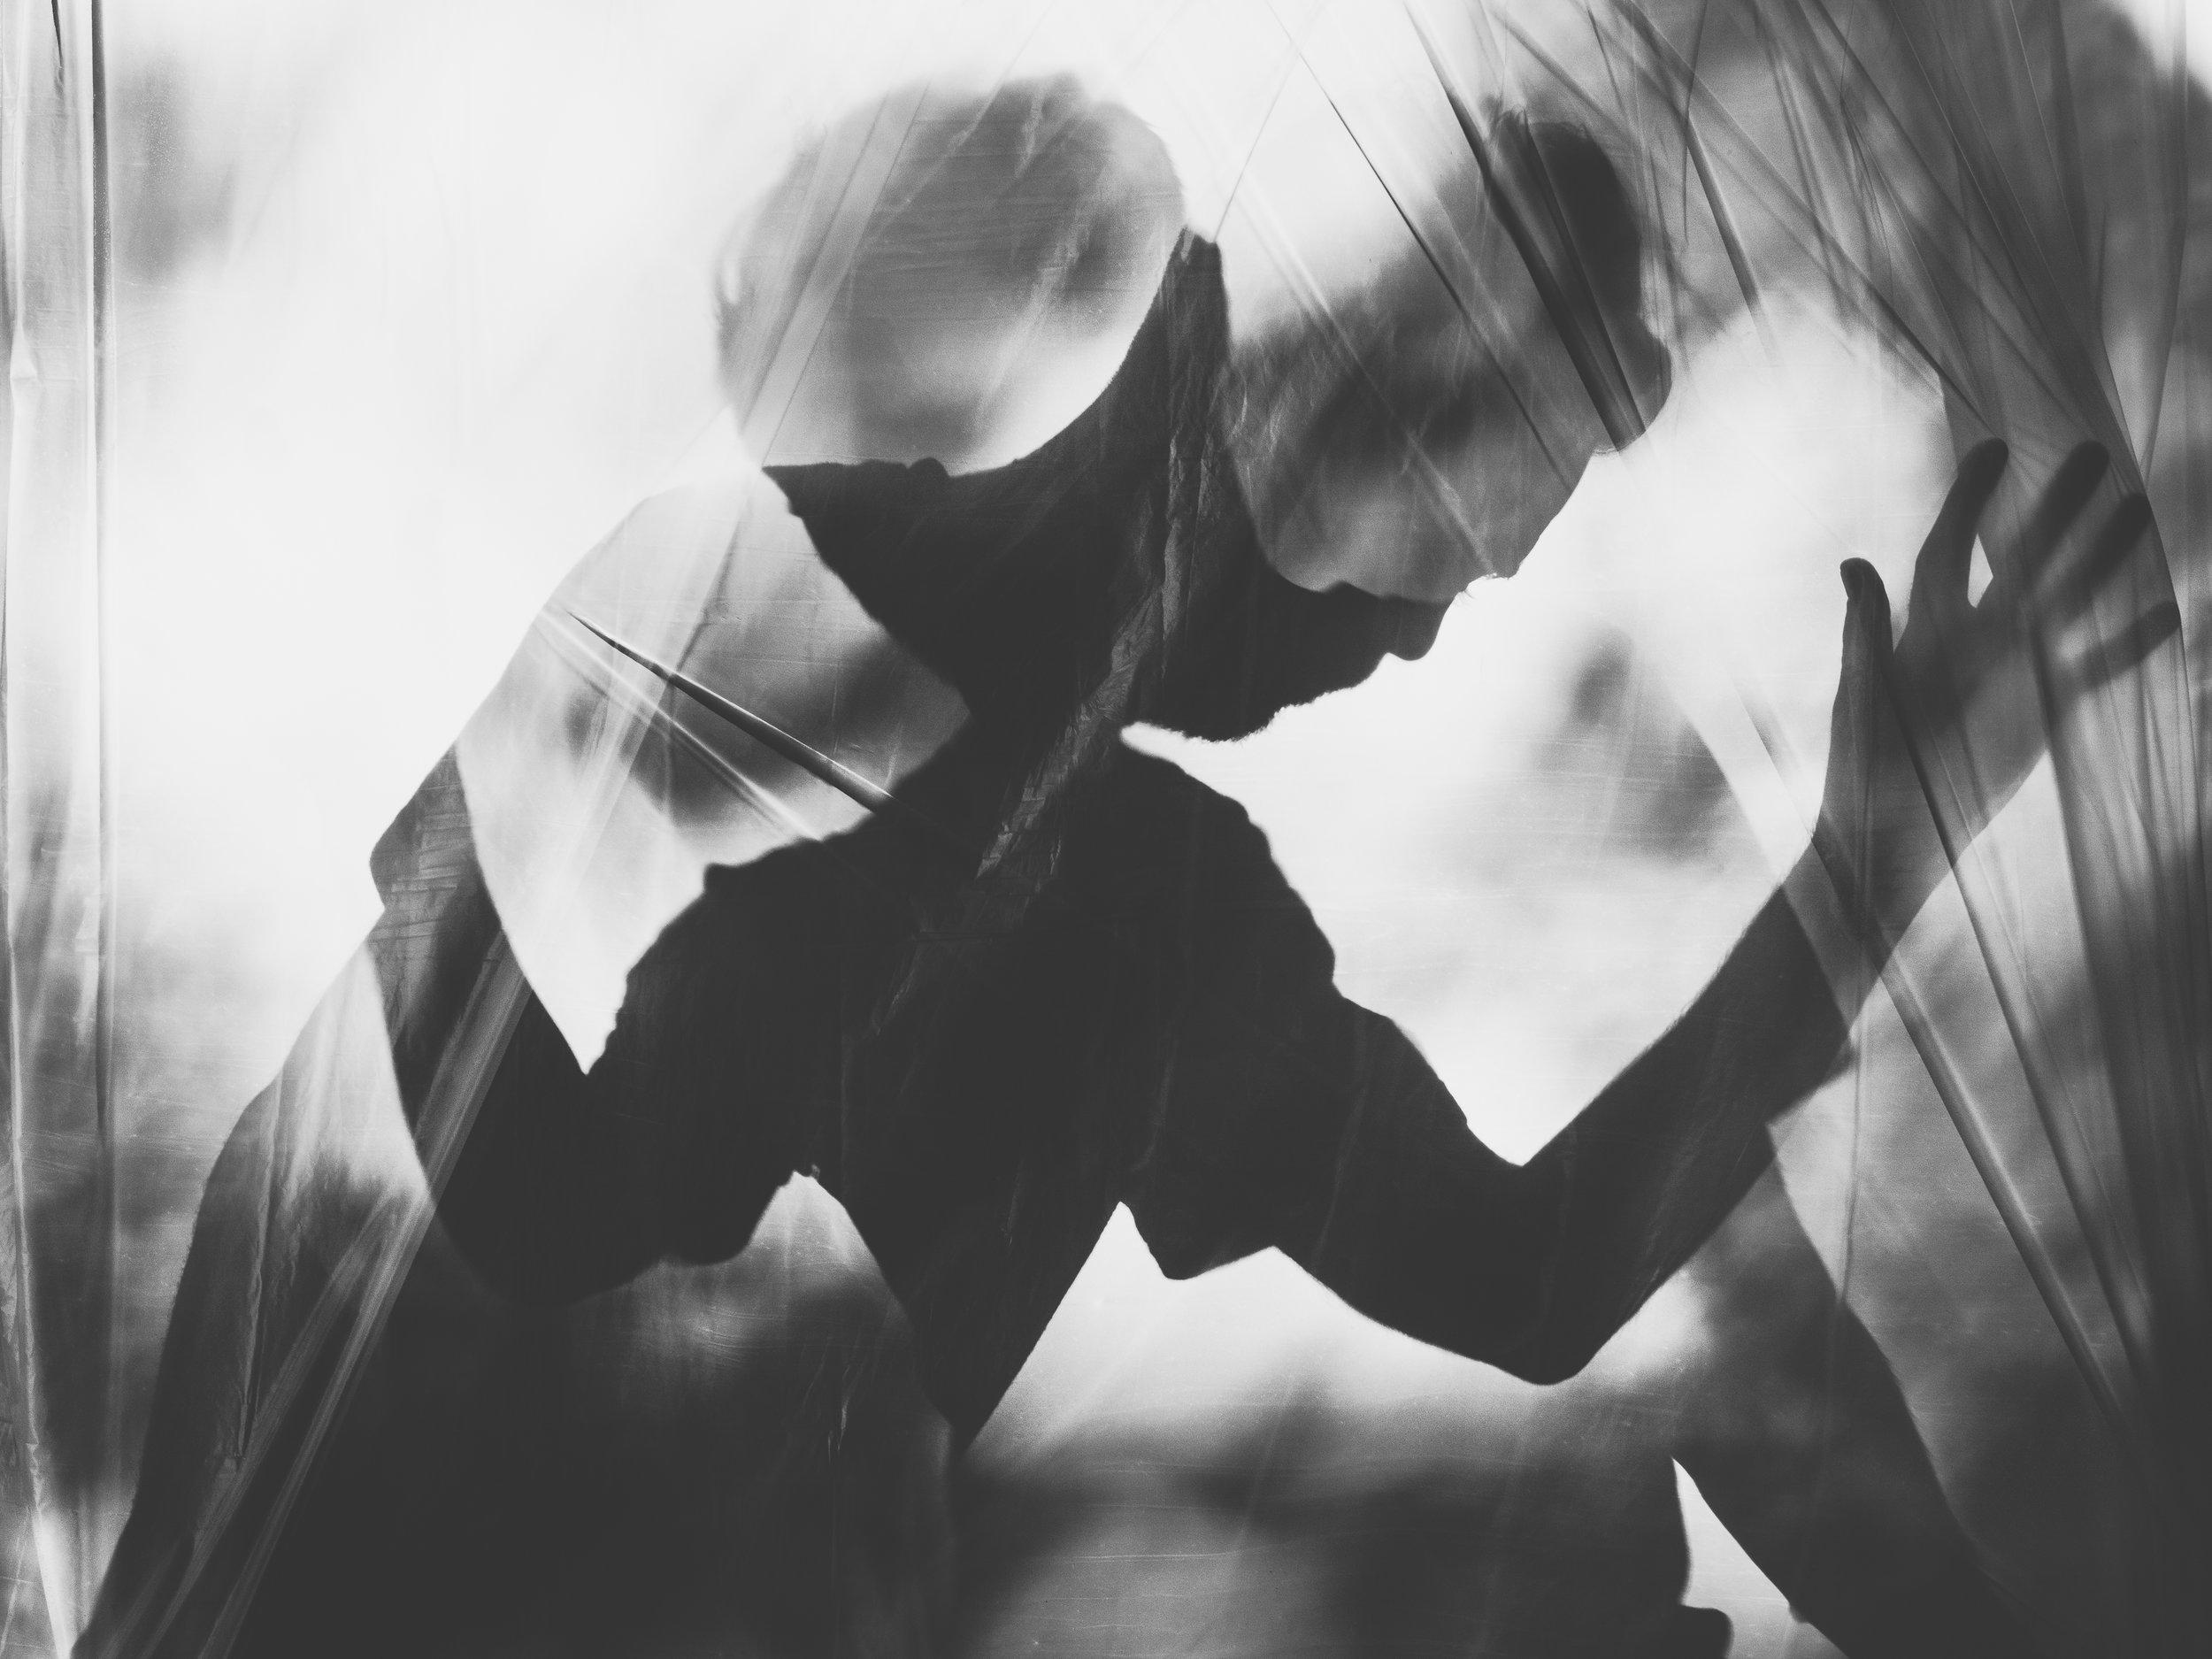 Se rencontrer © Audrey Thizy.jpg